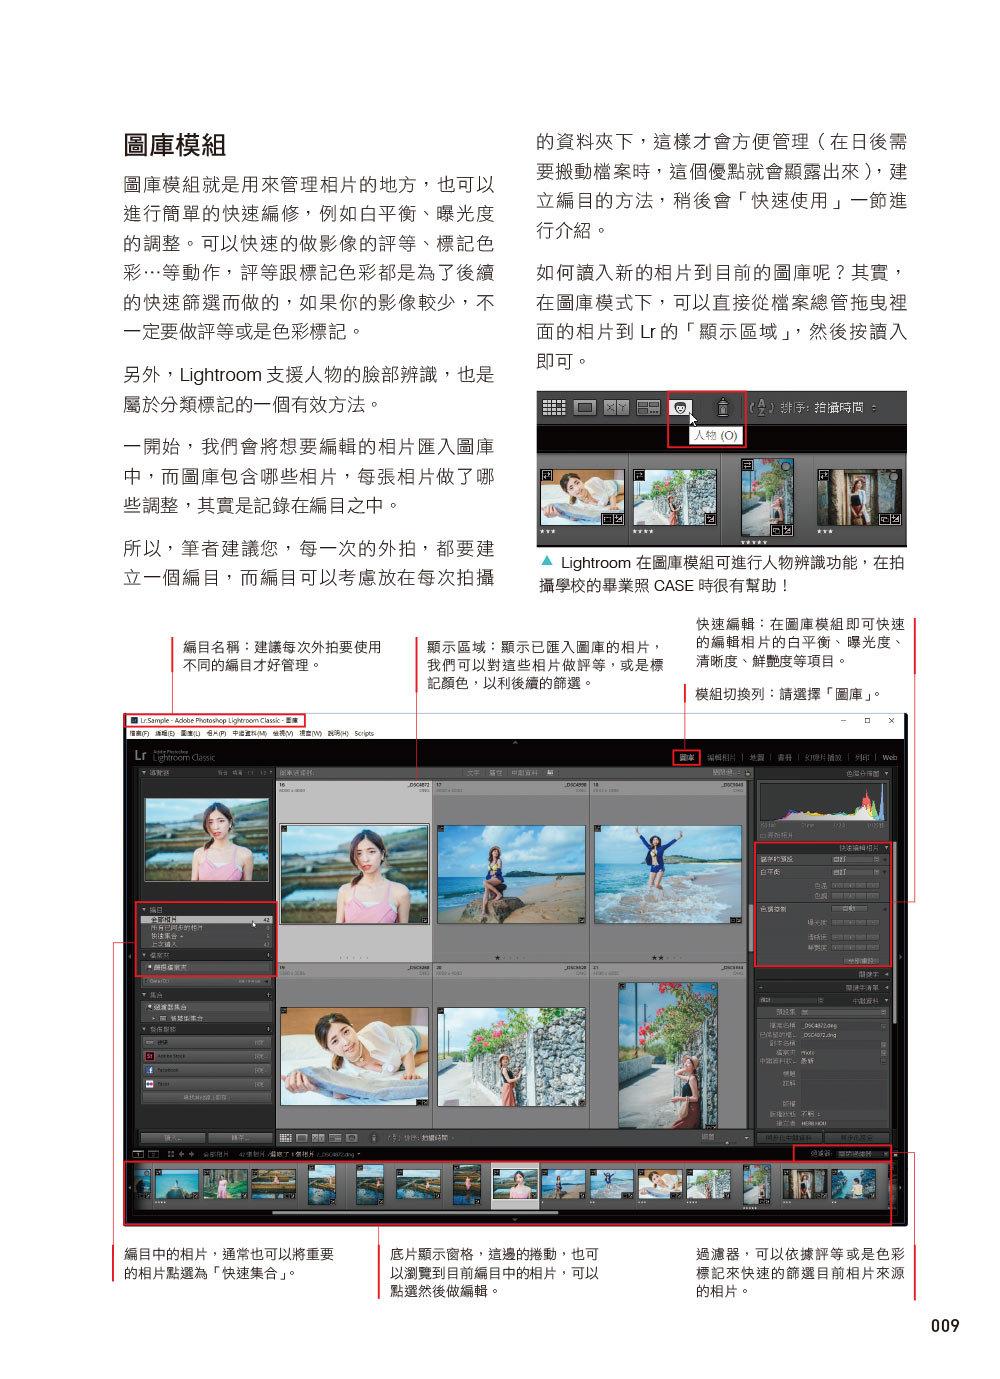 Lightroom Classic 魅力人像修圖經典版|調光調色x美膚秘訣x日系風x韓式婚紗-preview-1